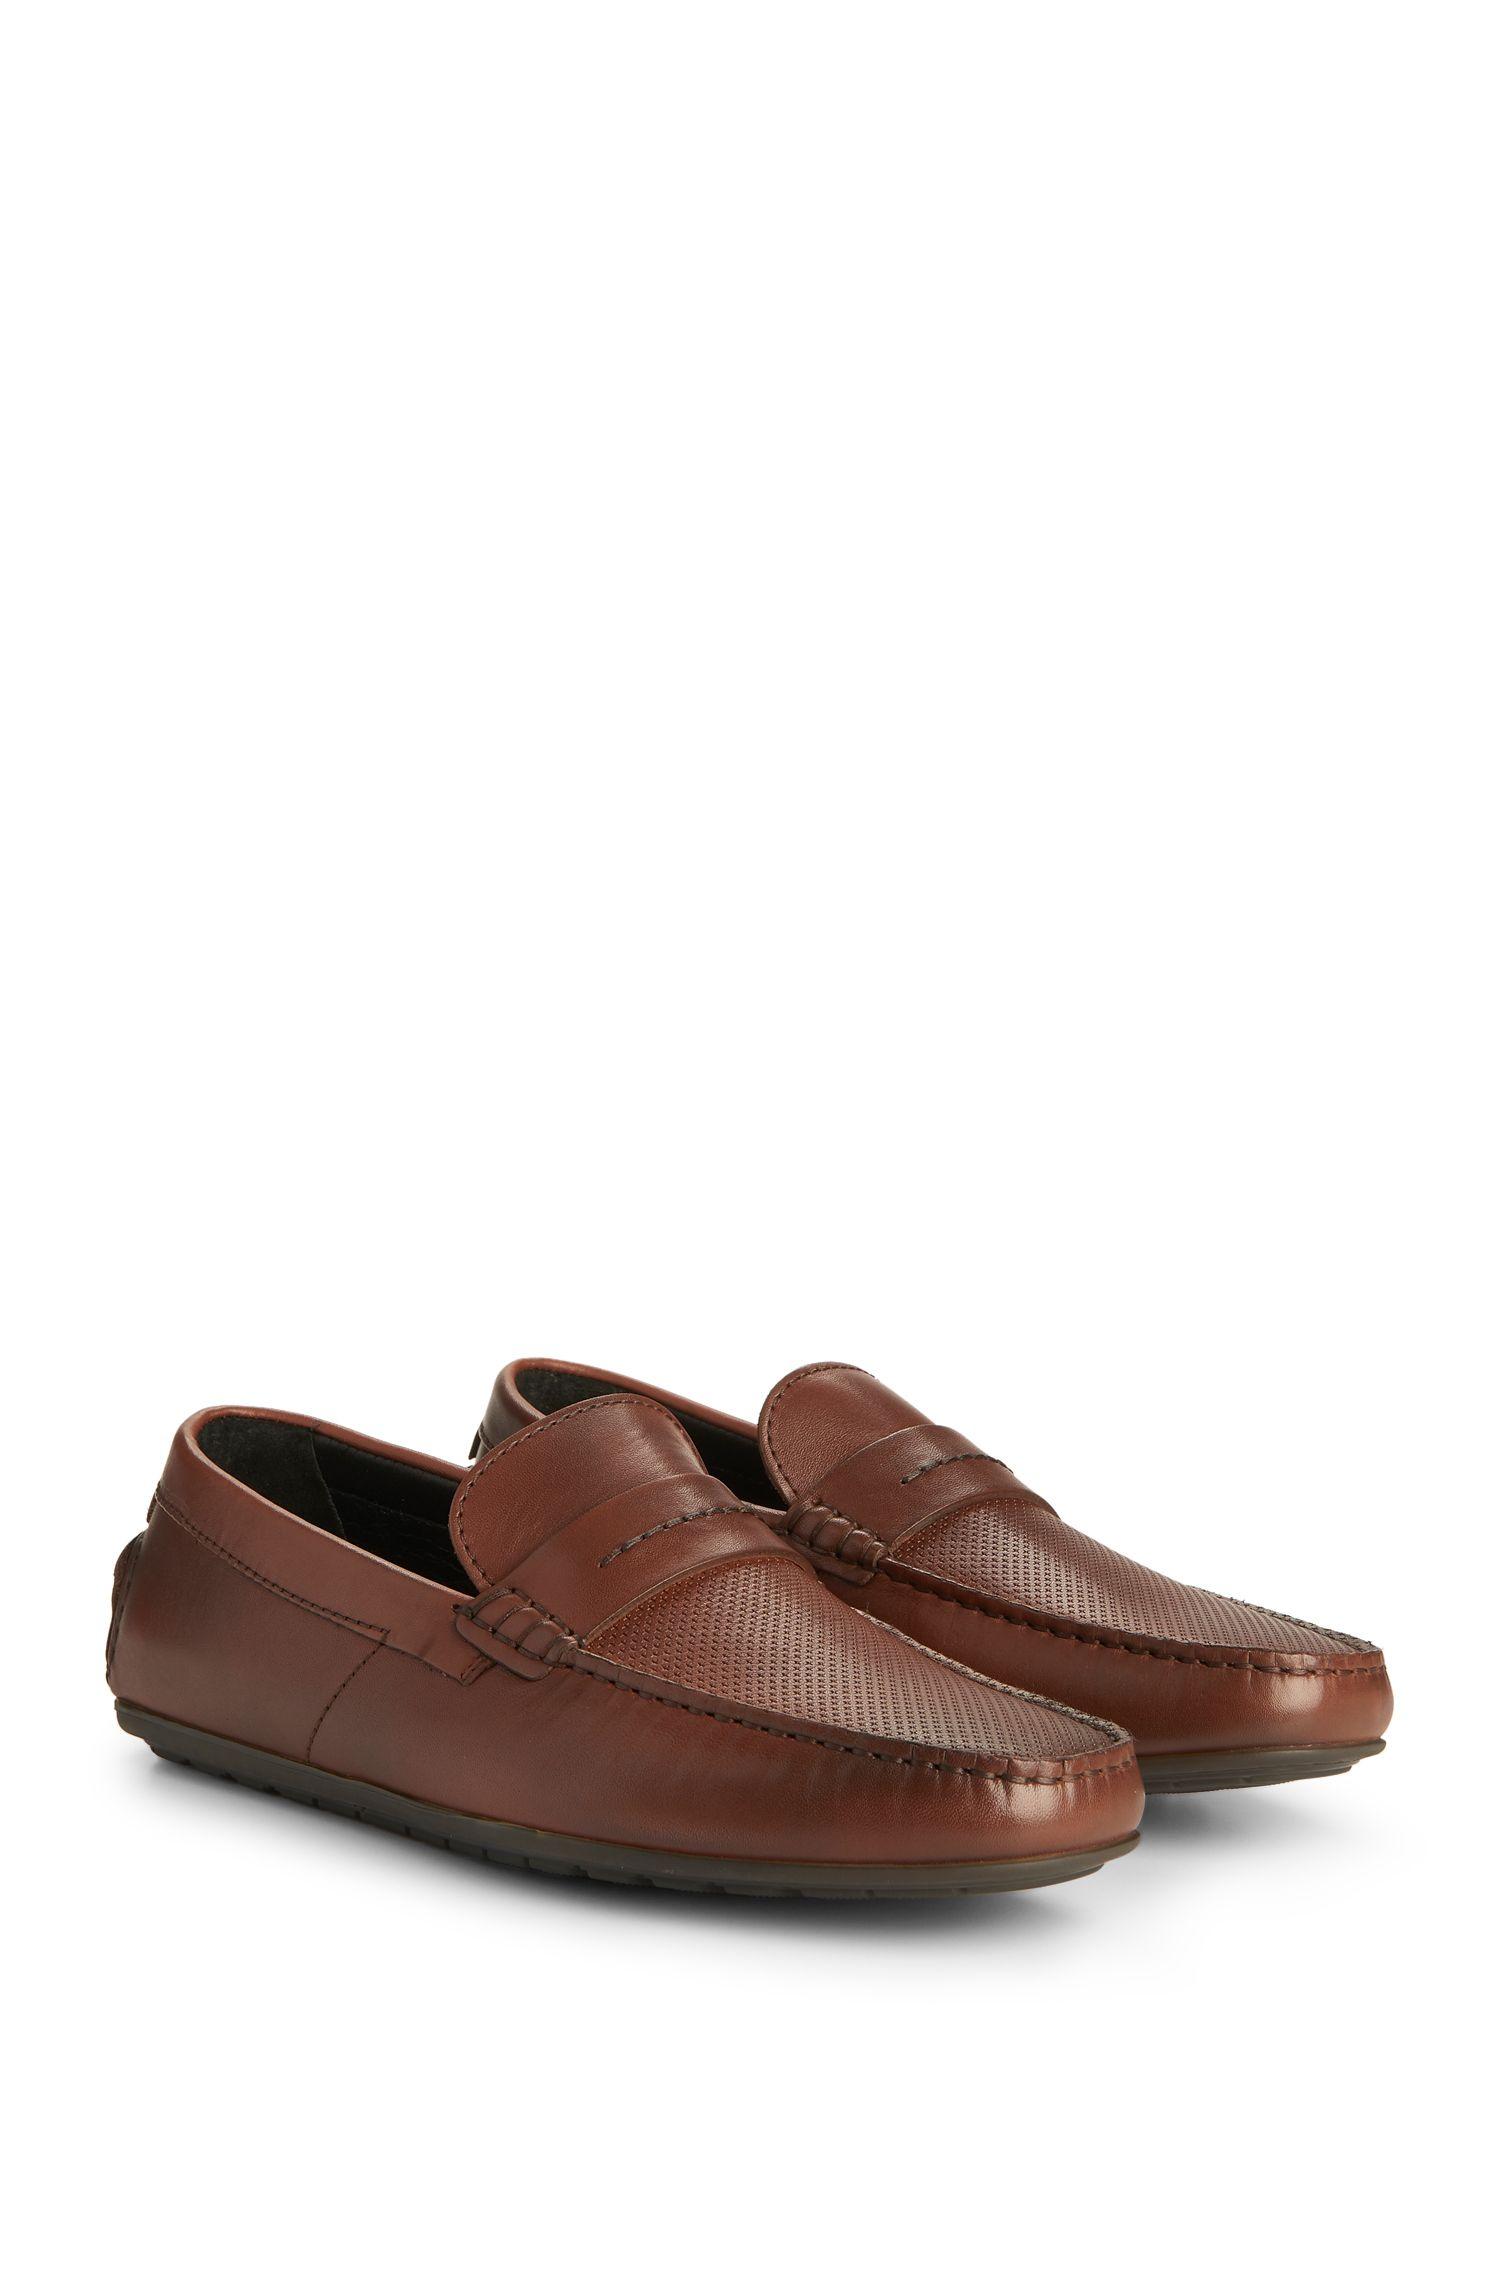 Leather Driving Loafer | Dandy Mocc Plpr